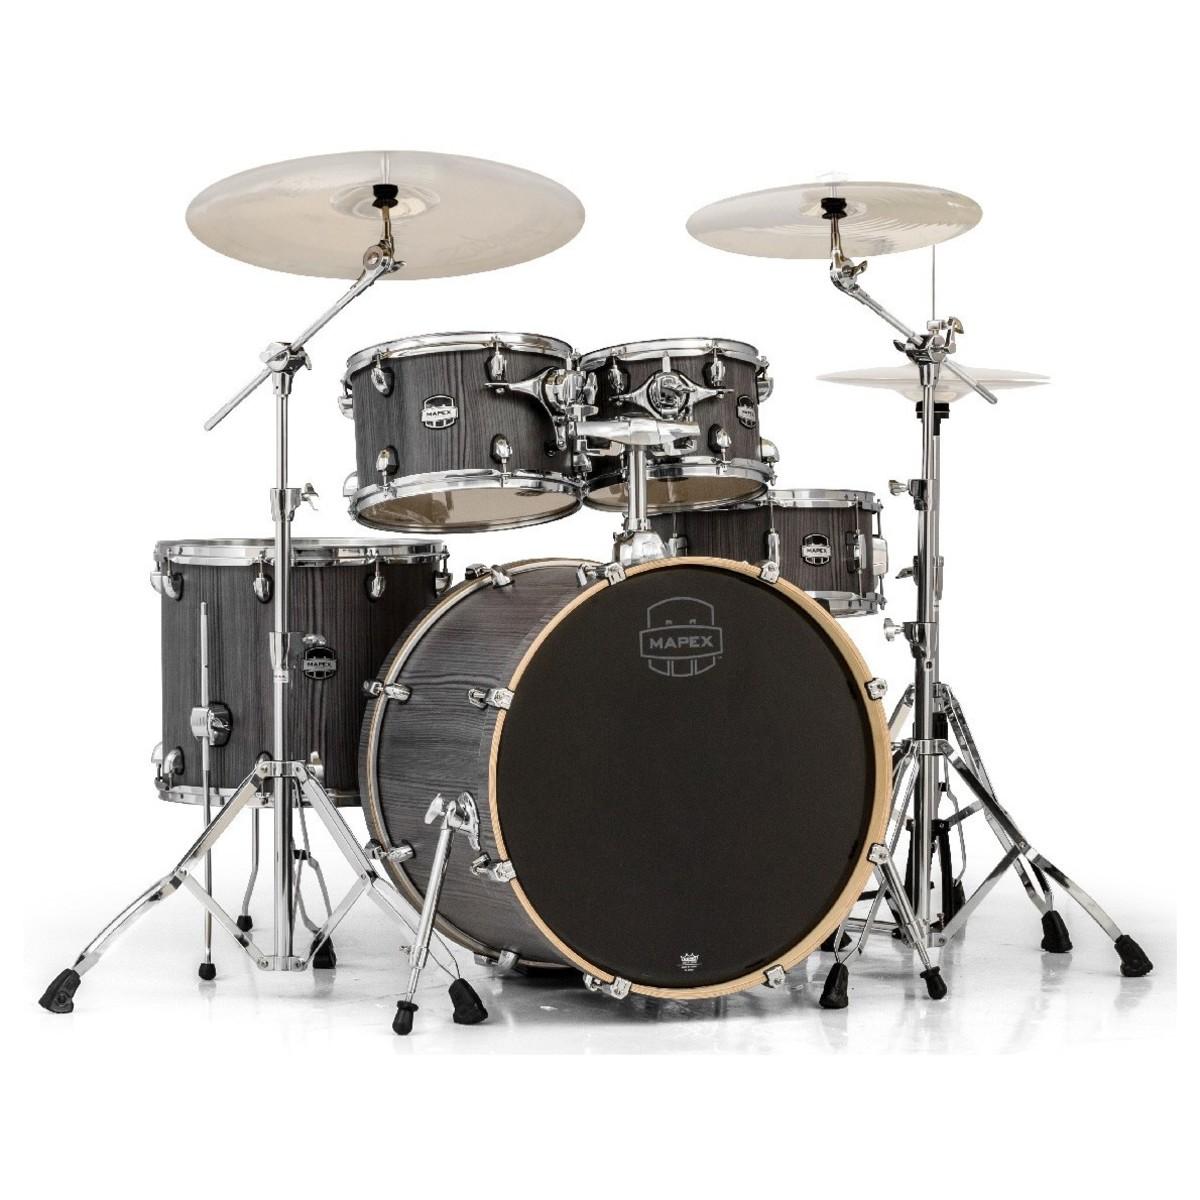 mapex mars 529 rock 22 39 39 5 piece drum kit smokewood at gear4music. Black Bedroom Furniture Sets. Home Design Ideas